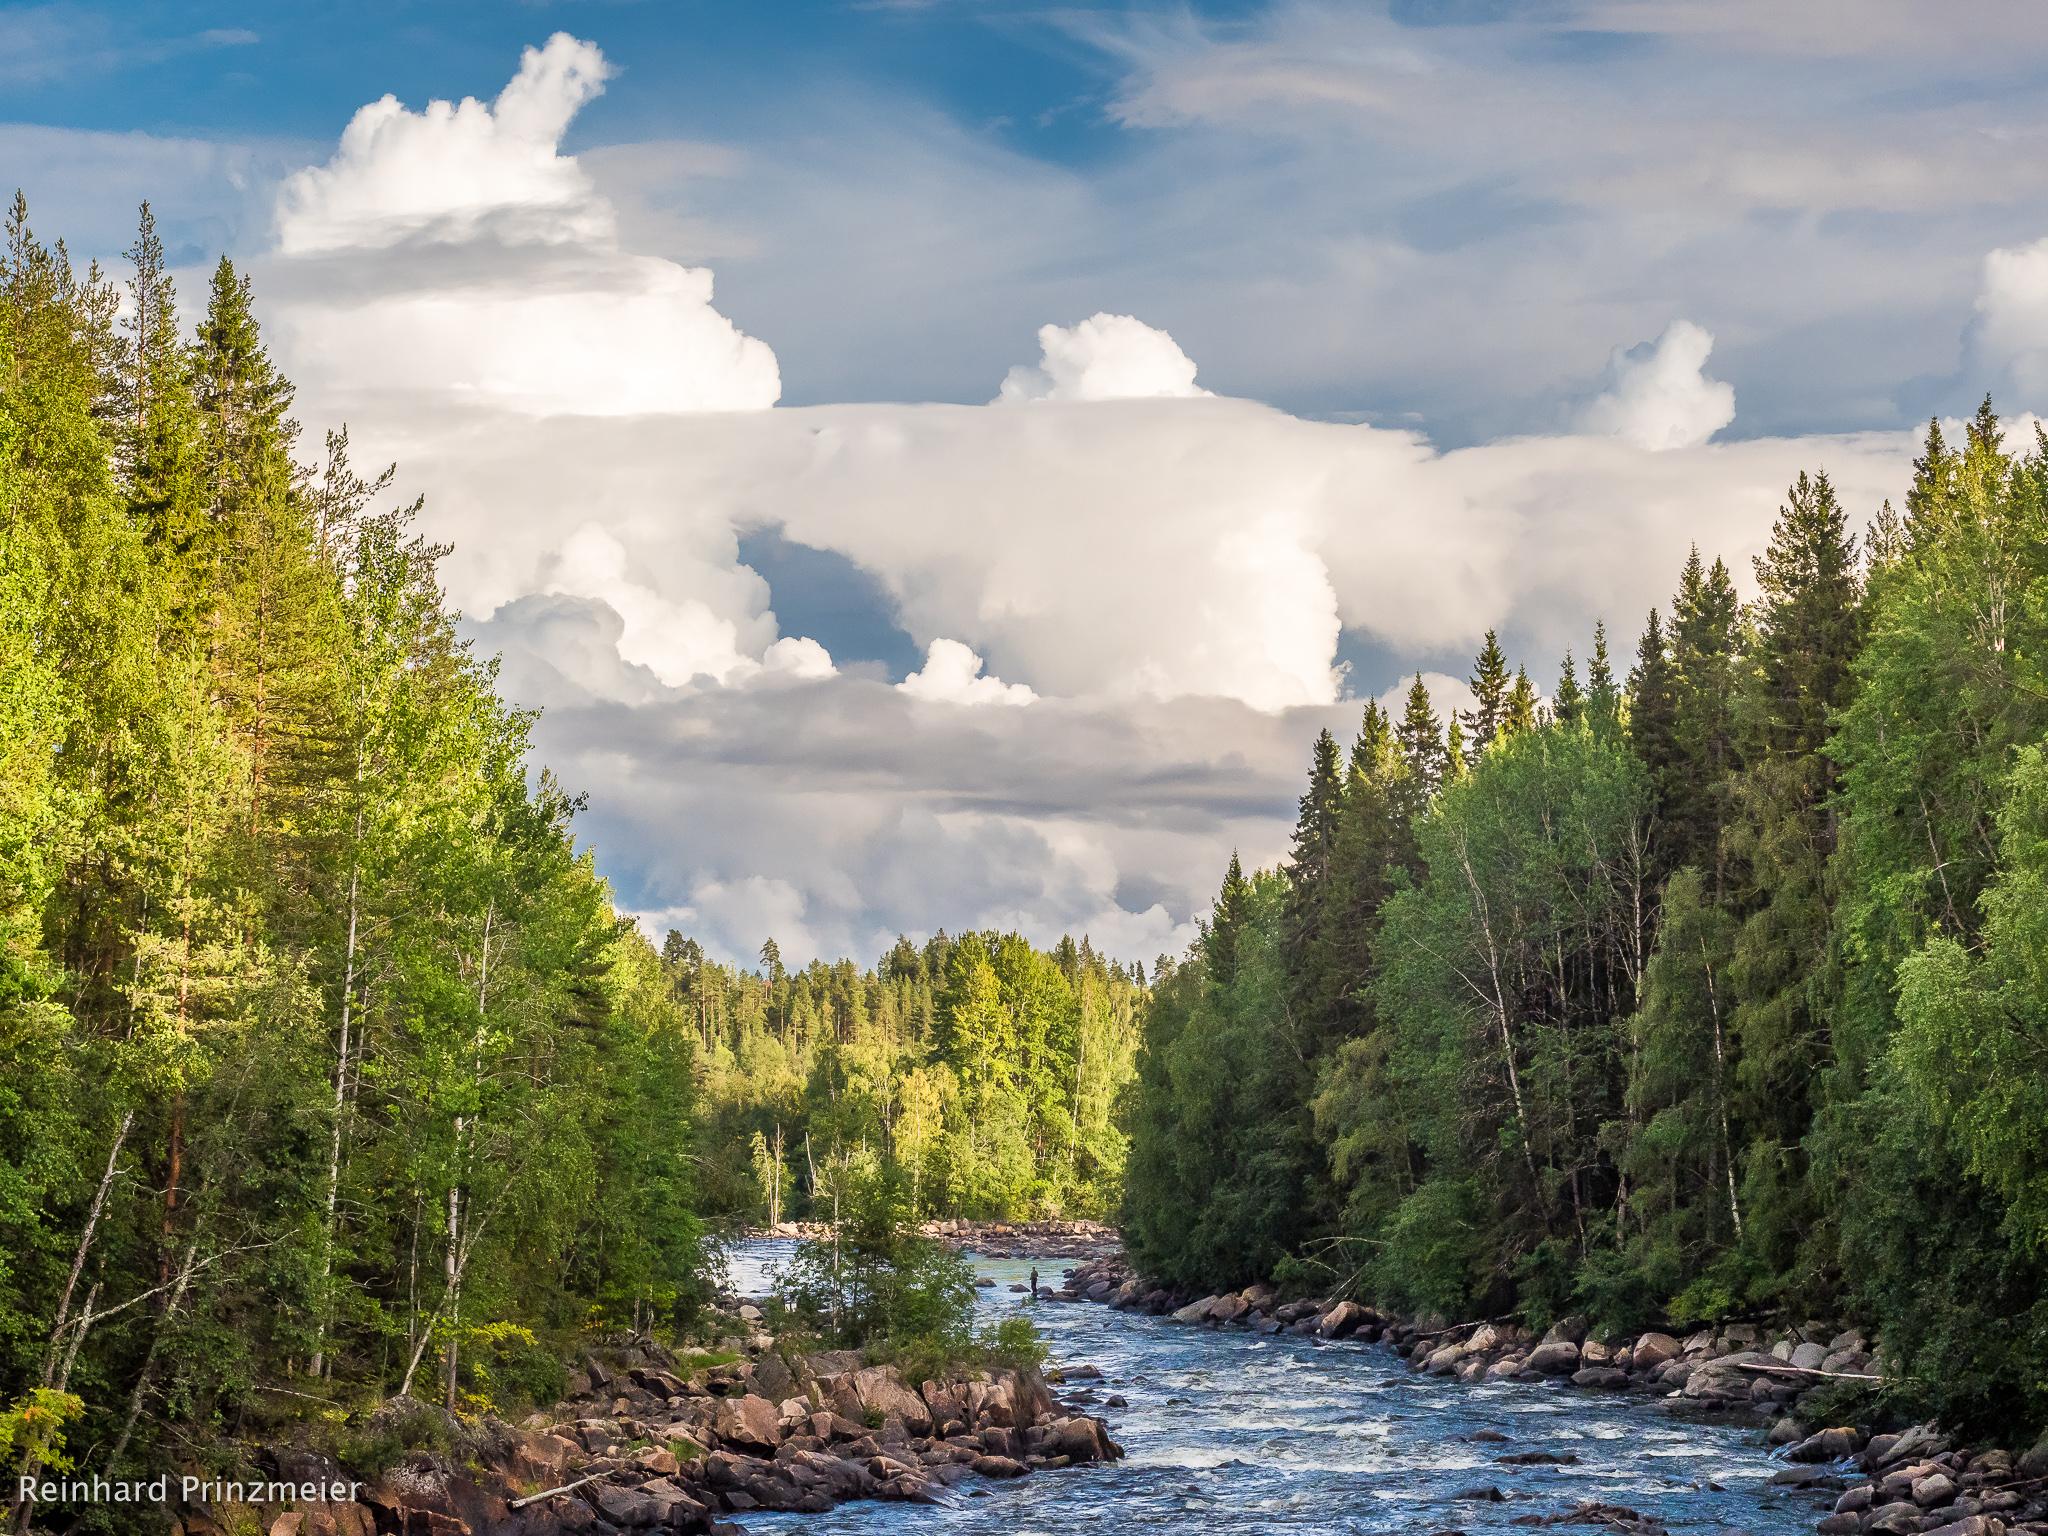 Laxfallen, Sweden